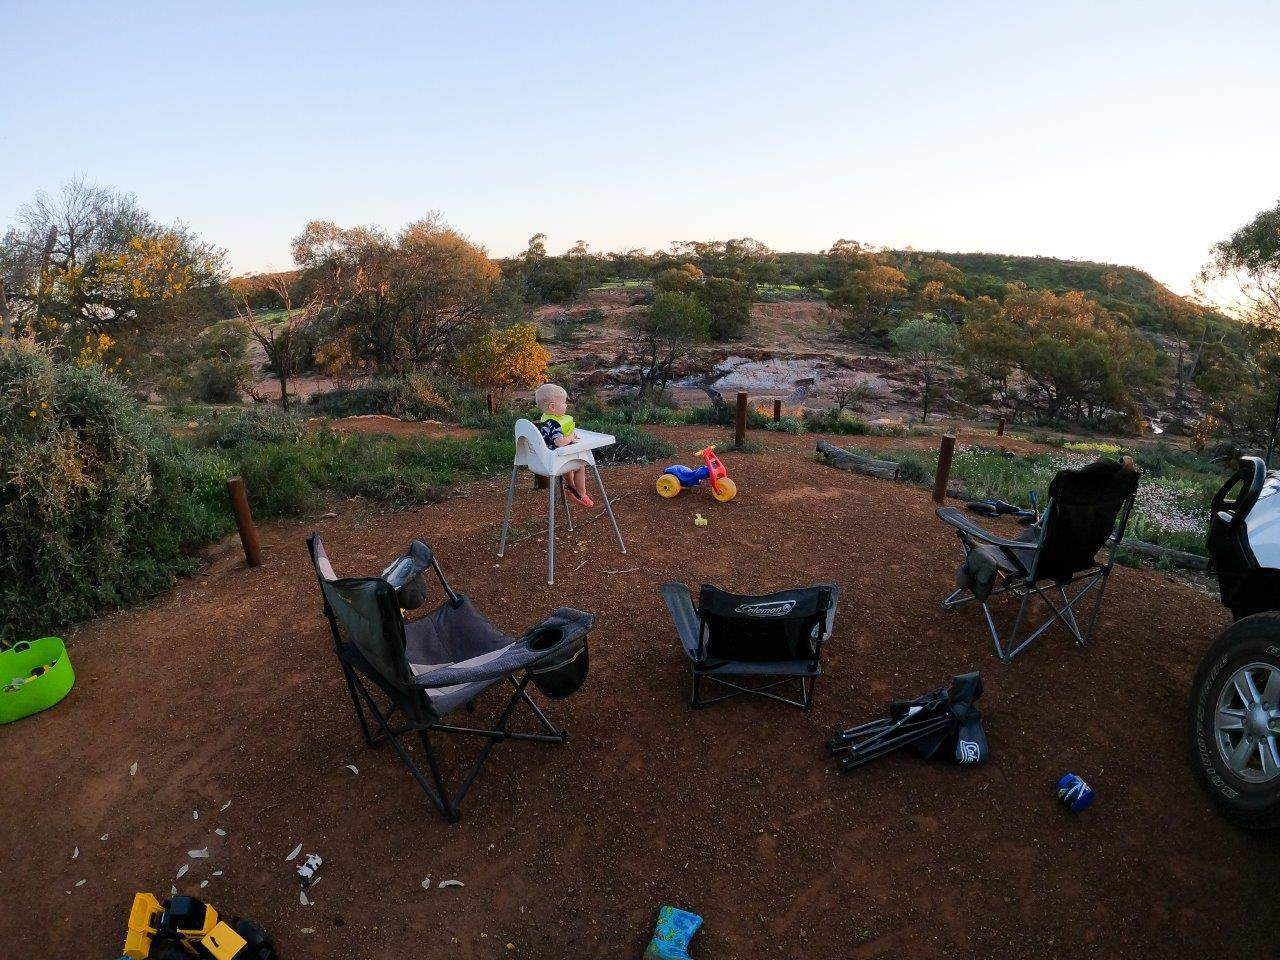 Coalseam Conservation Park camping